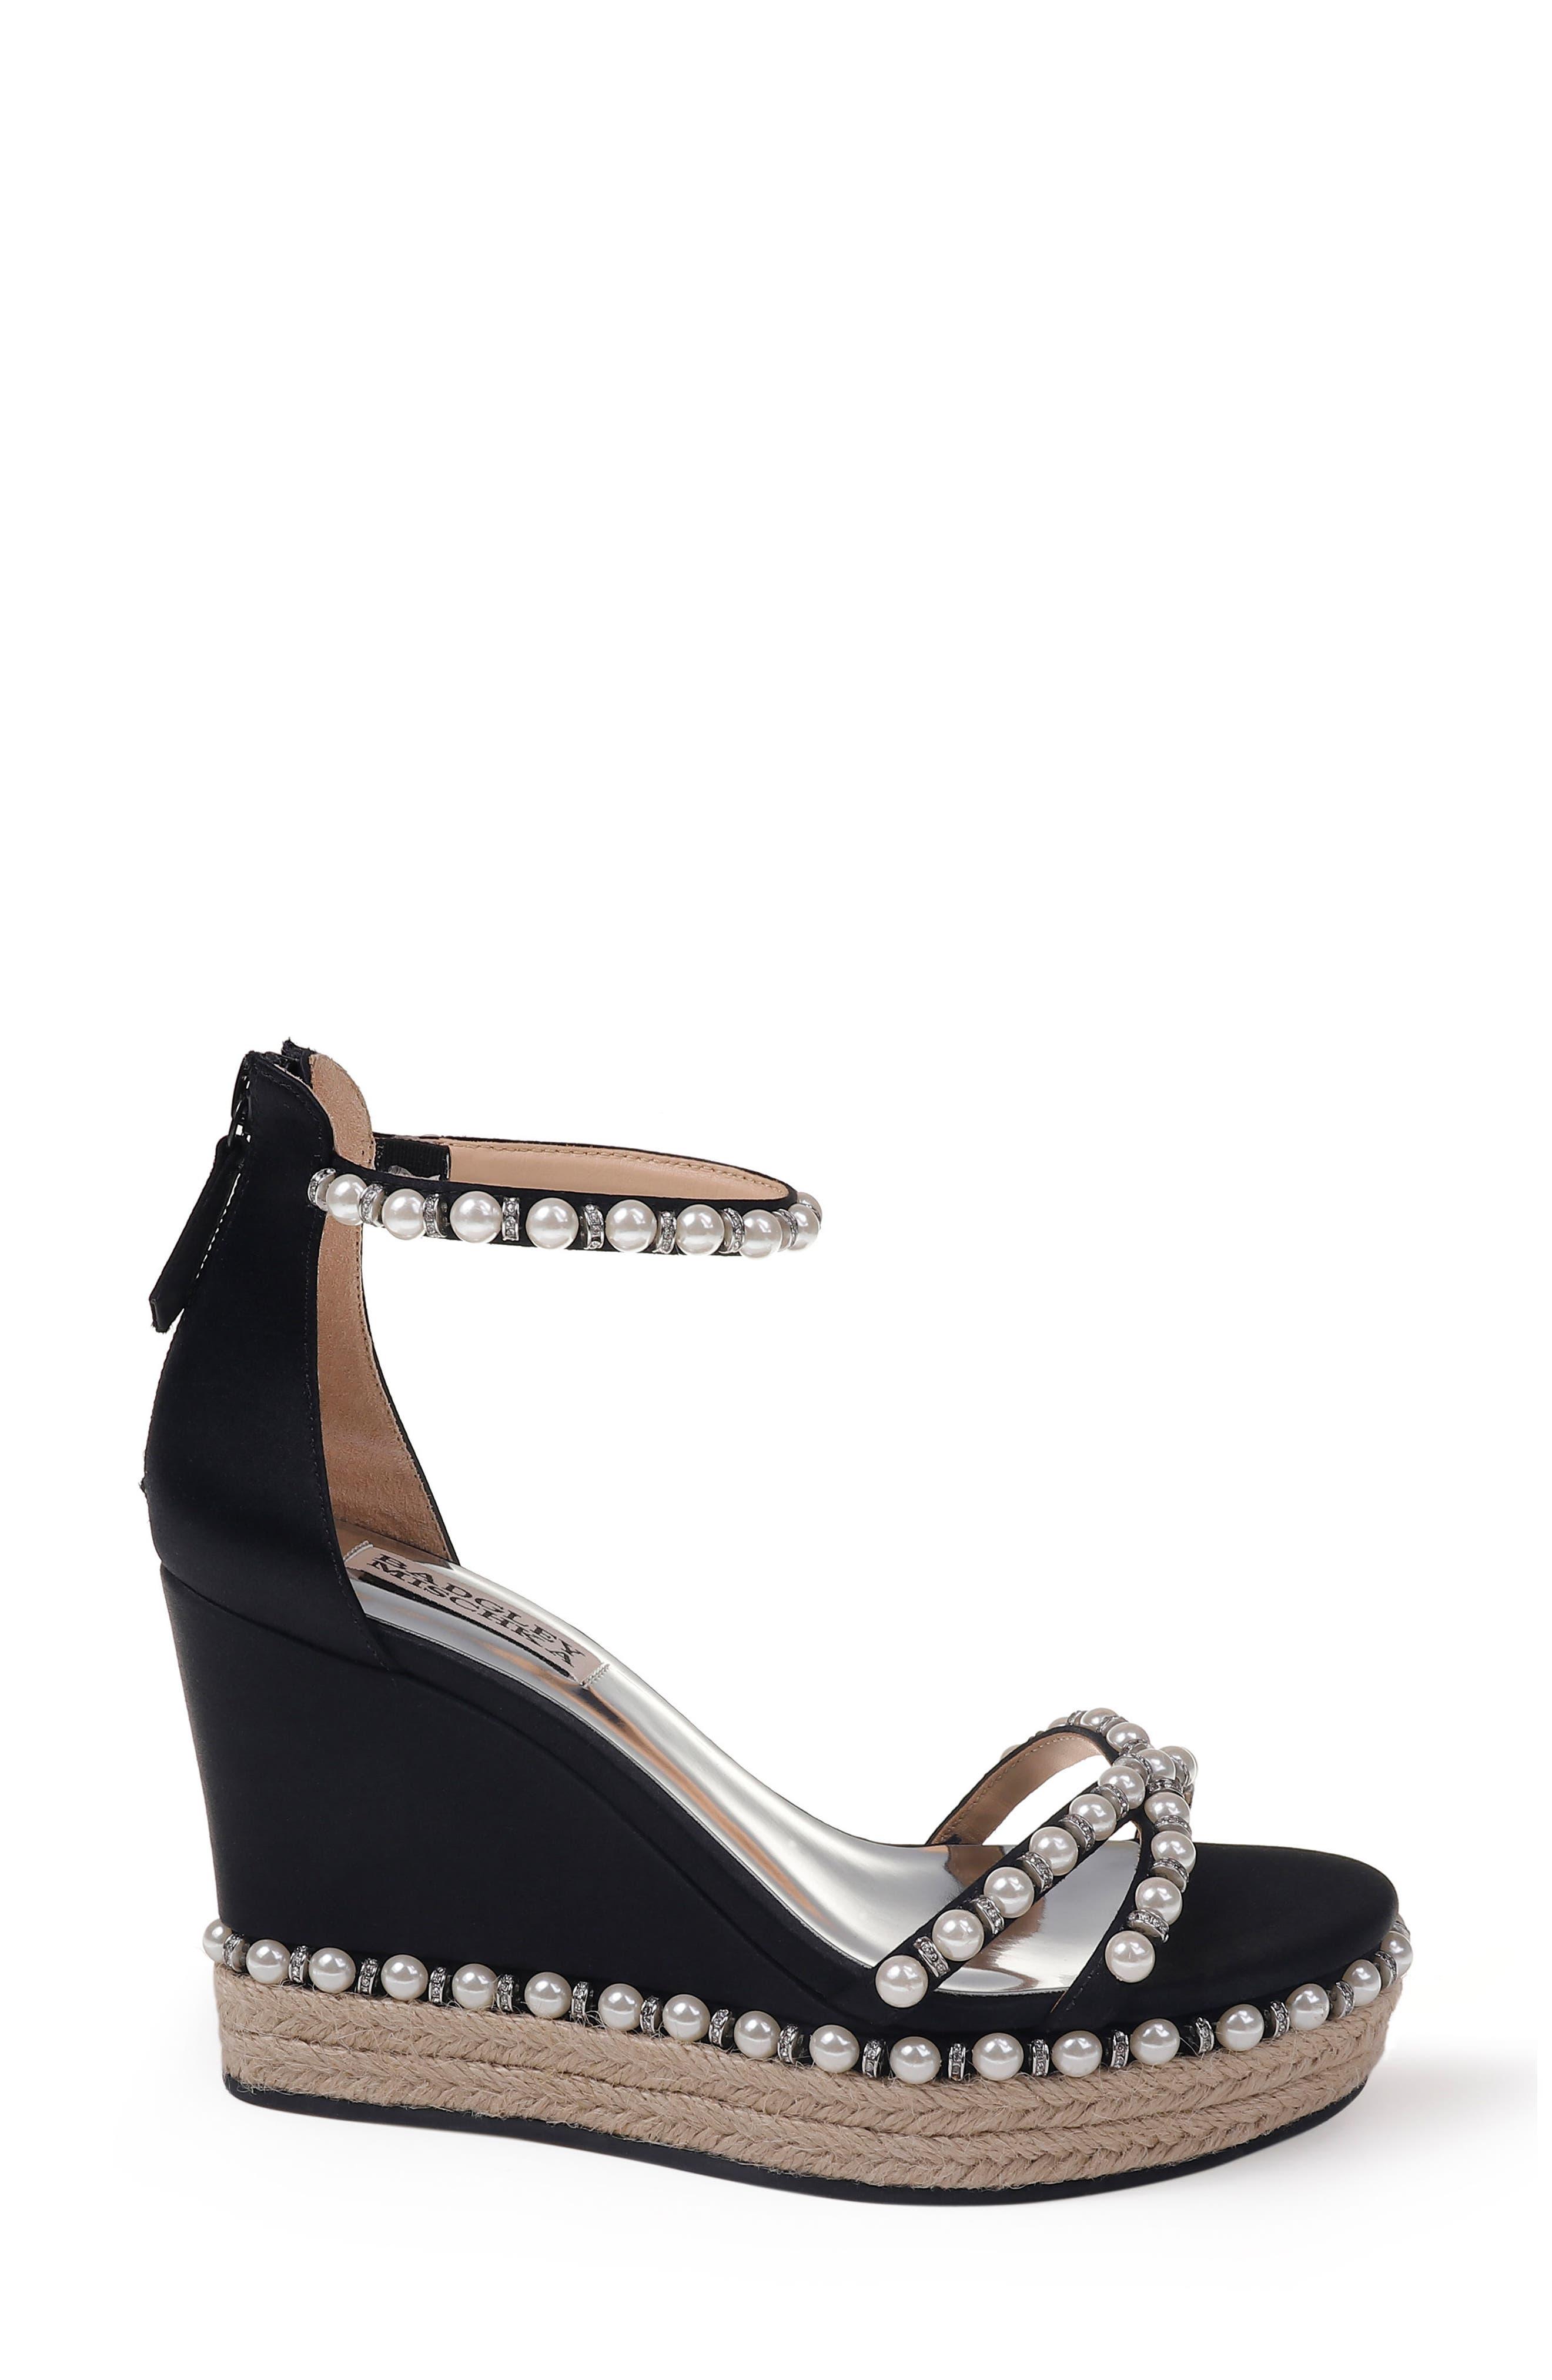 Alternate Image 3  - Badgley Mischka Sloan Wedge Sandal (Women)